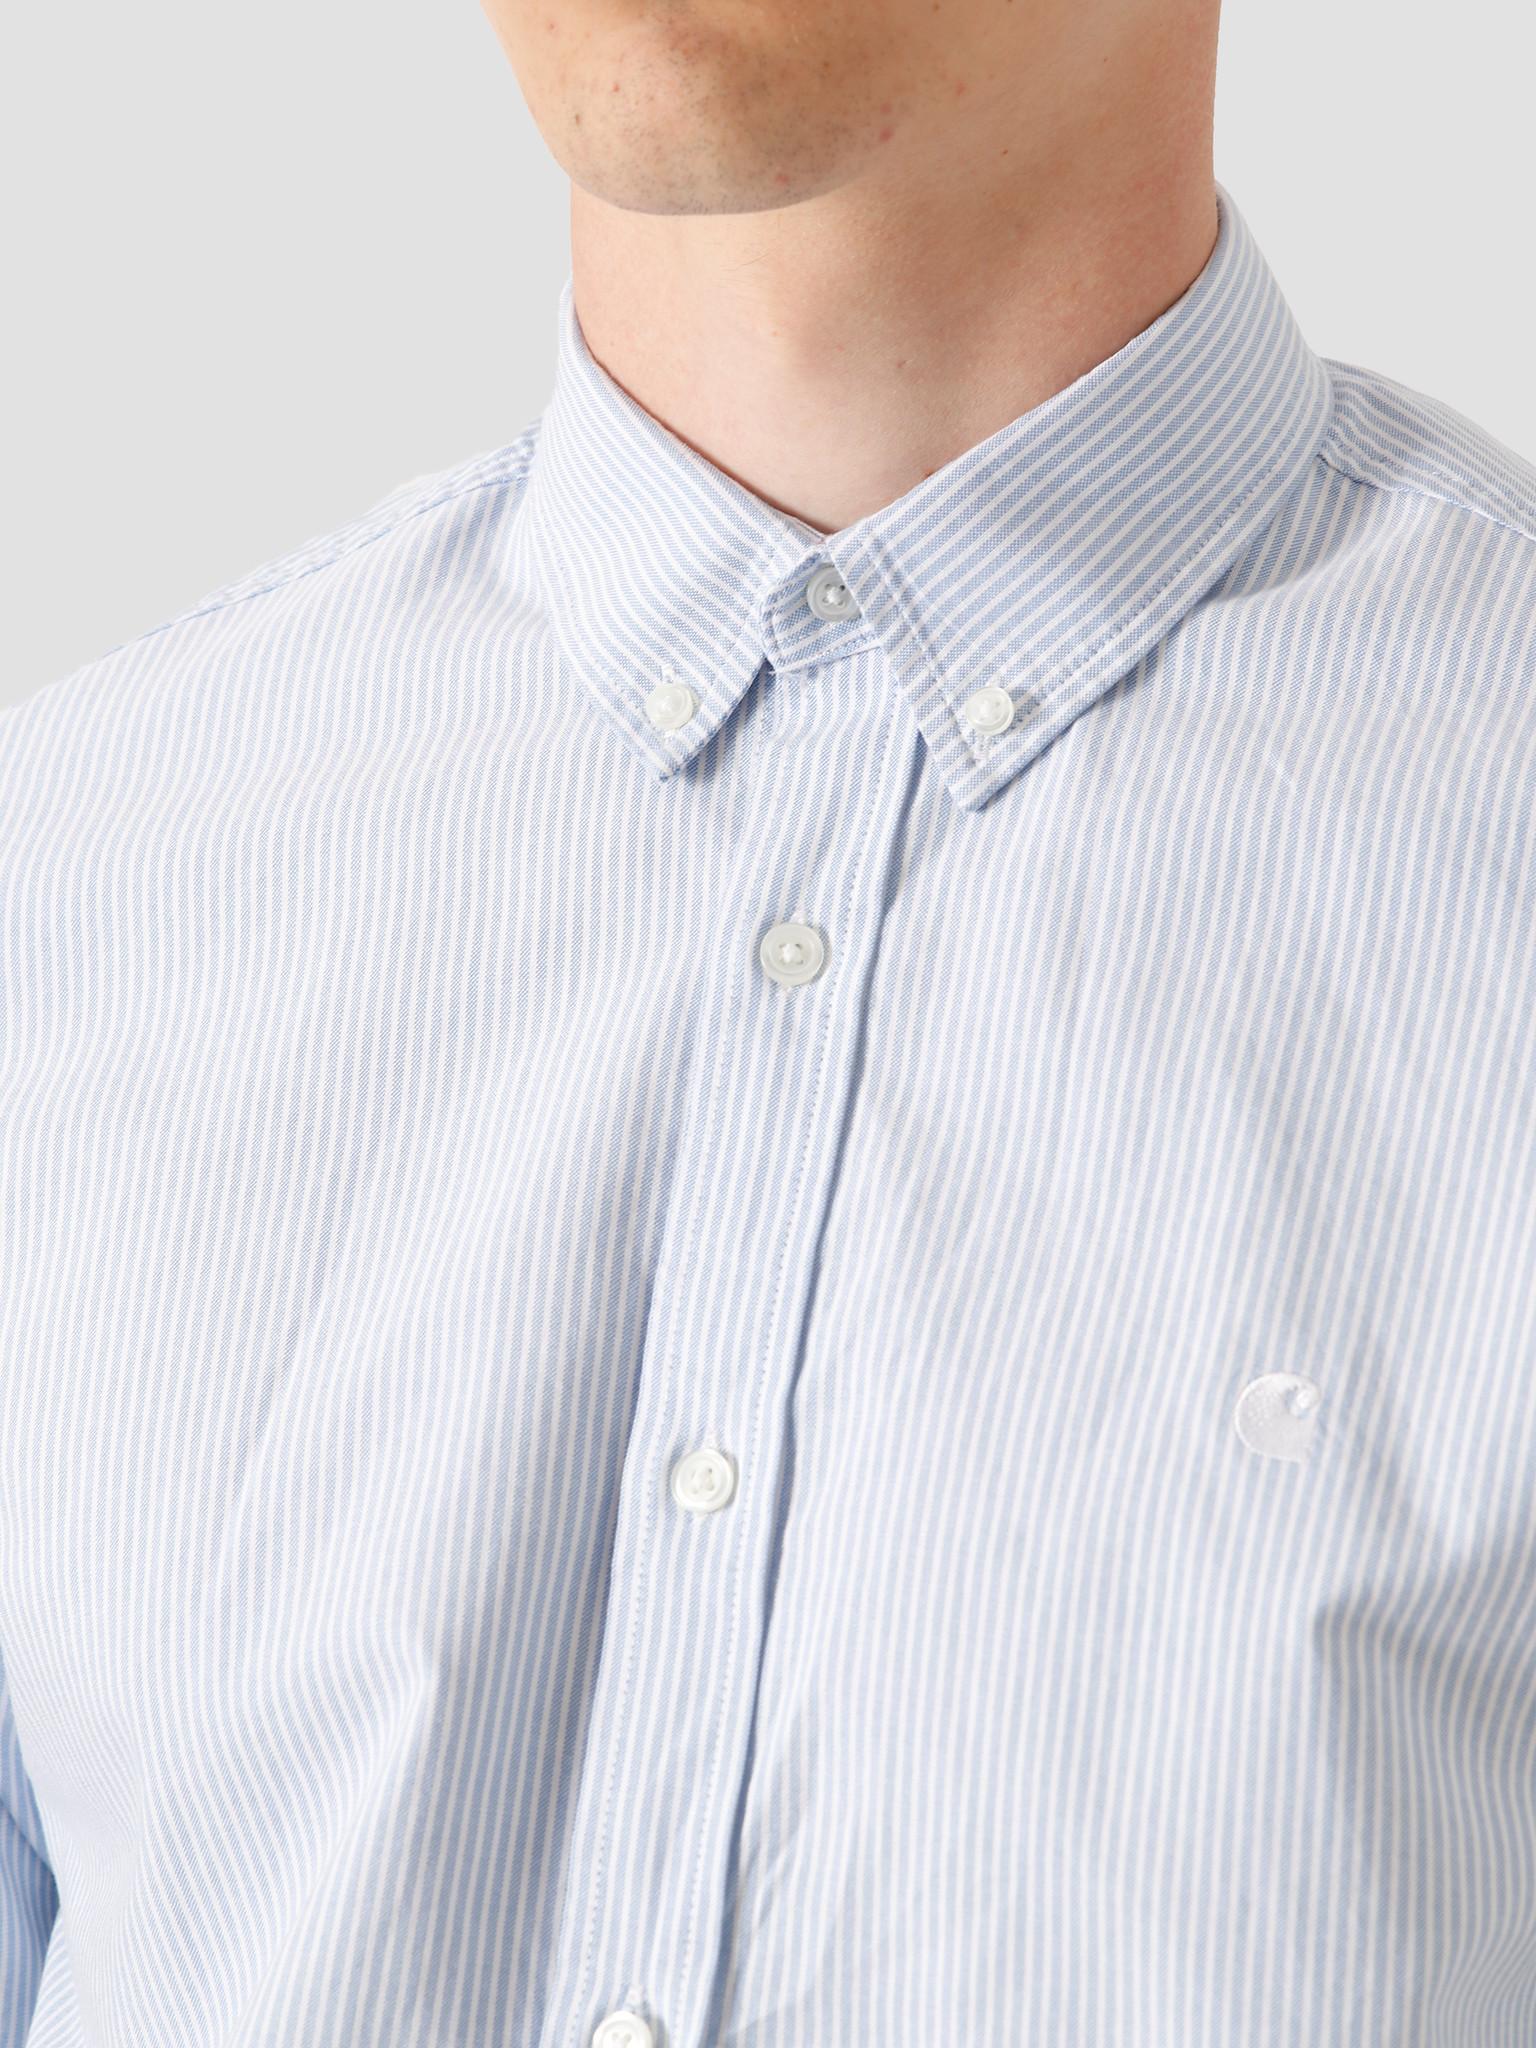 Carhartt WIP Carhartt WIP Duffield Shirt Duffield Stripe Bleach White I025245-KY90